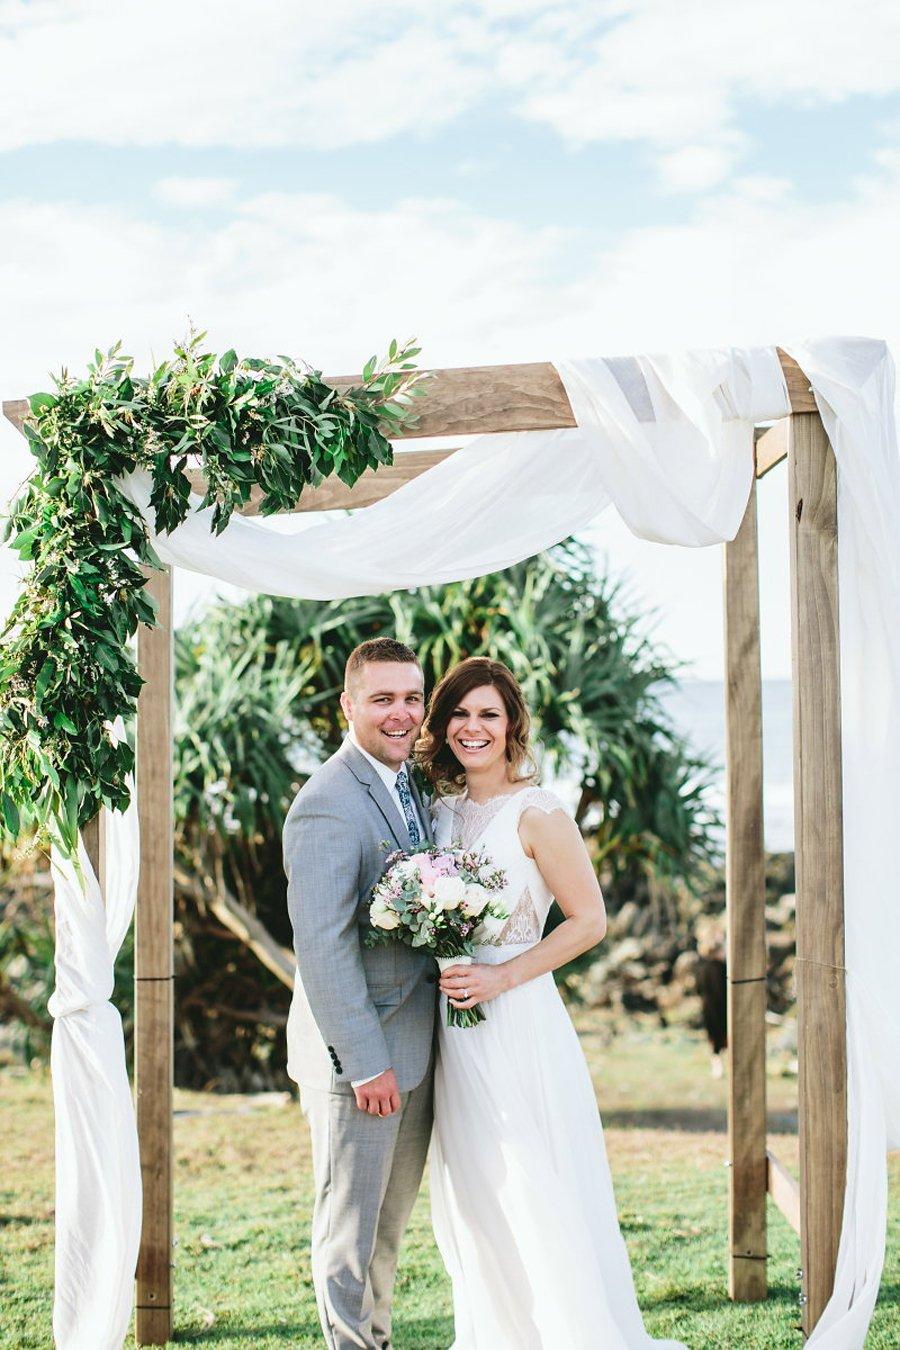 Scott and Krystal's Osteria Real Wedding Tweed Coast Wedding Venue - Photo037